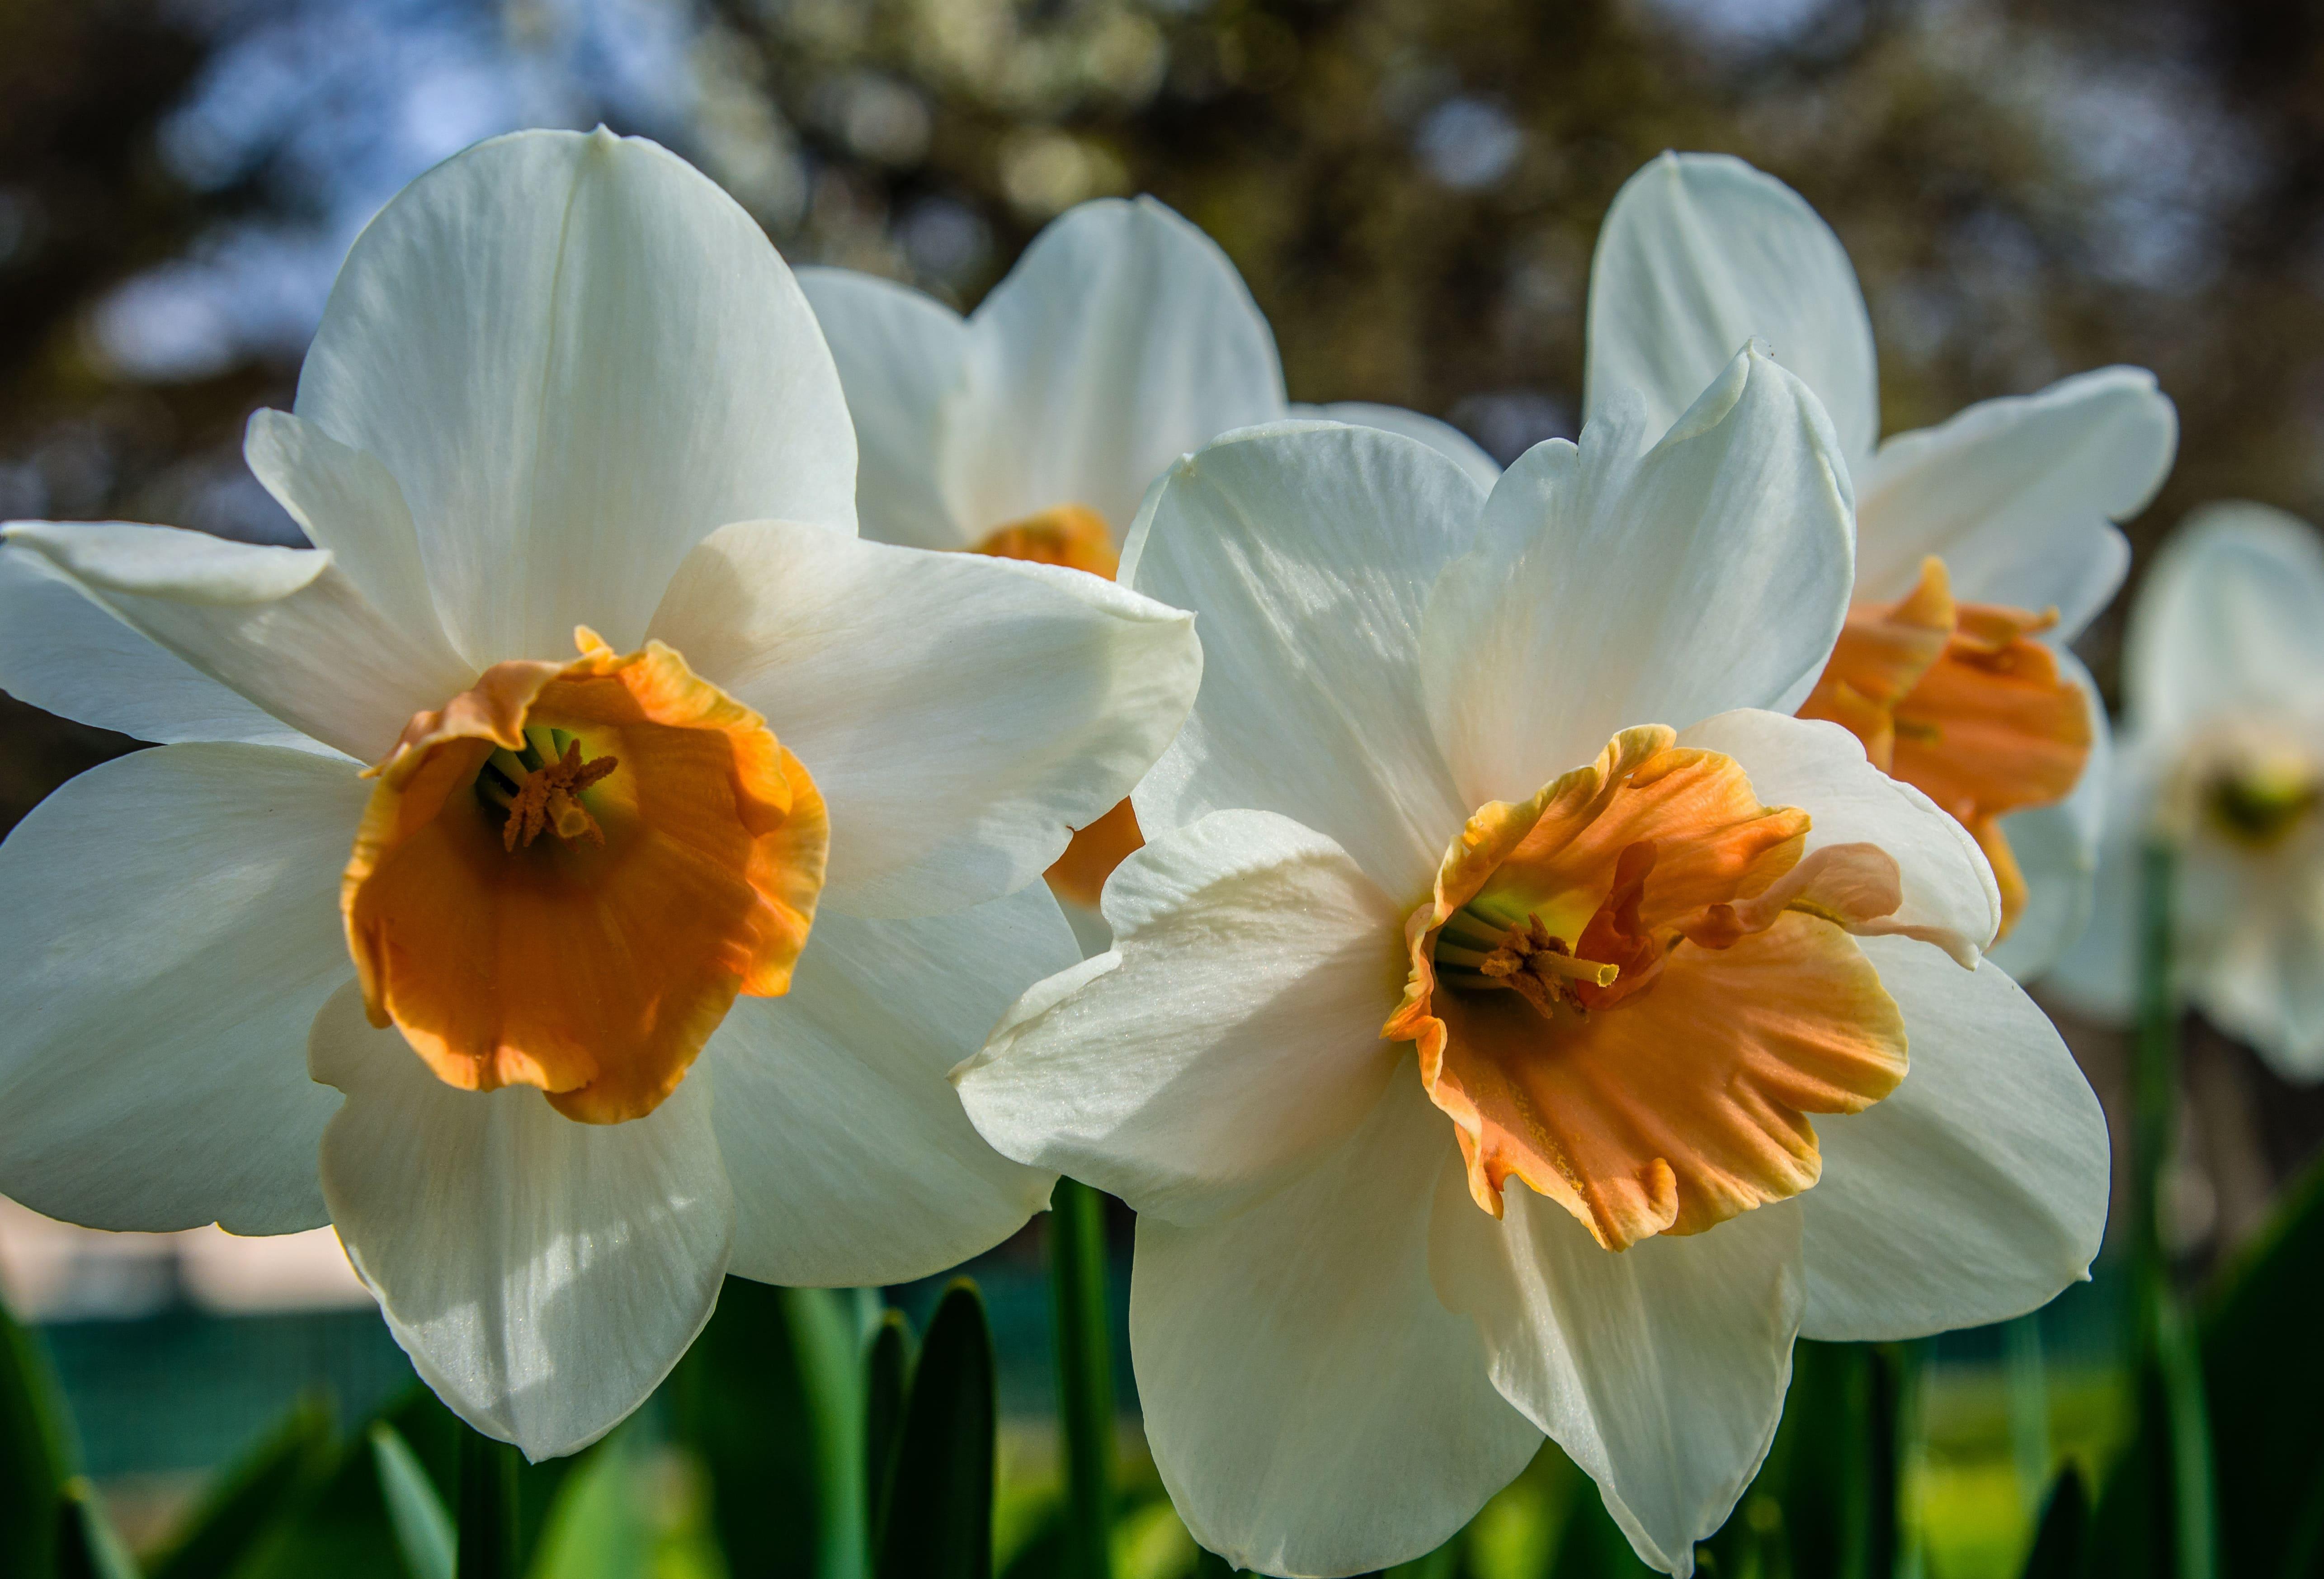 daffodils-photo-88